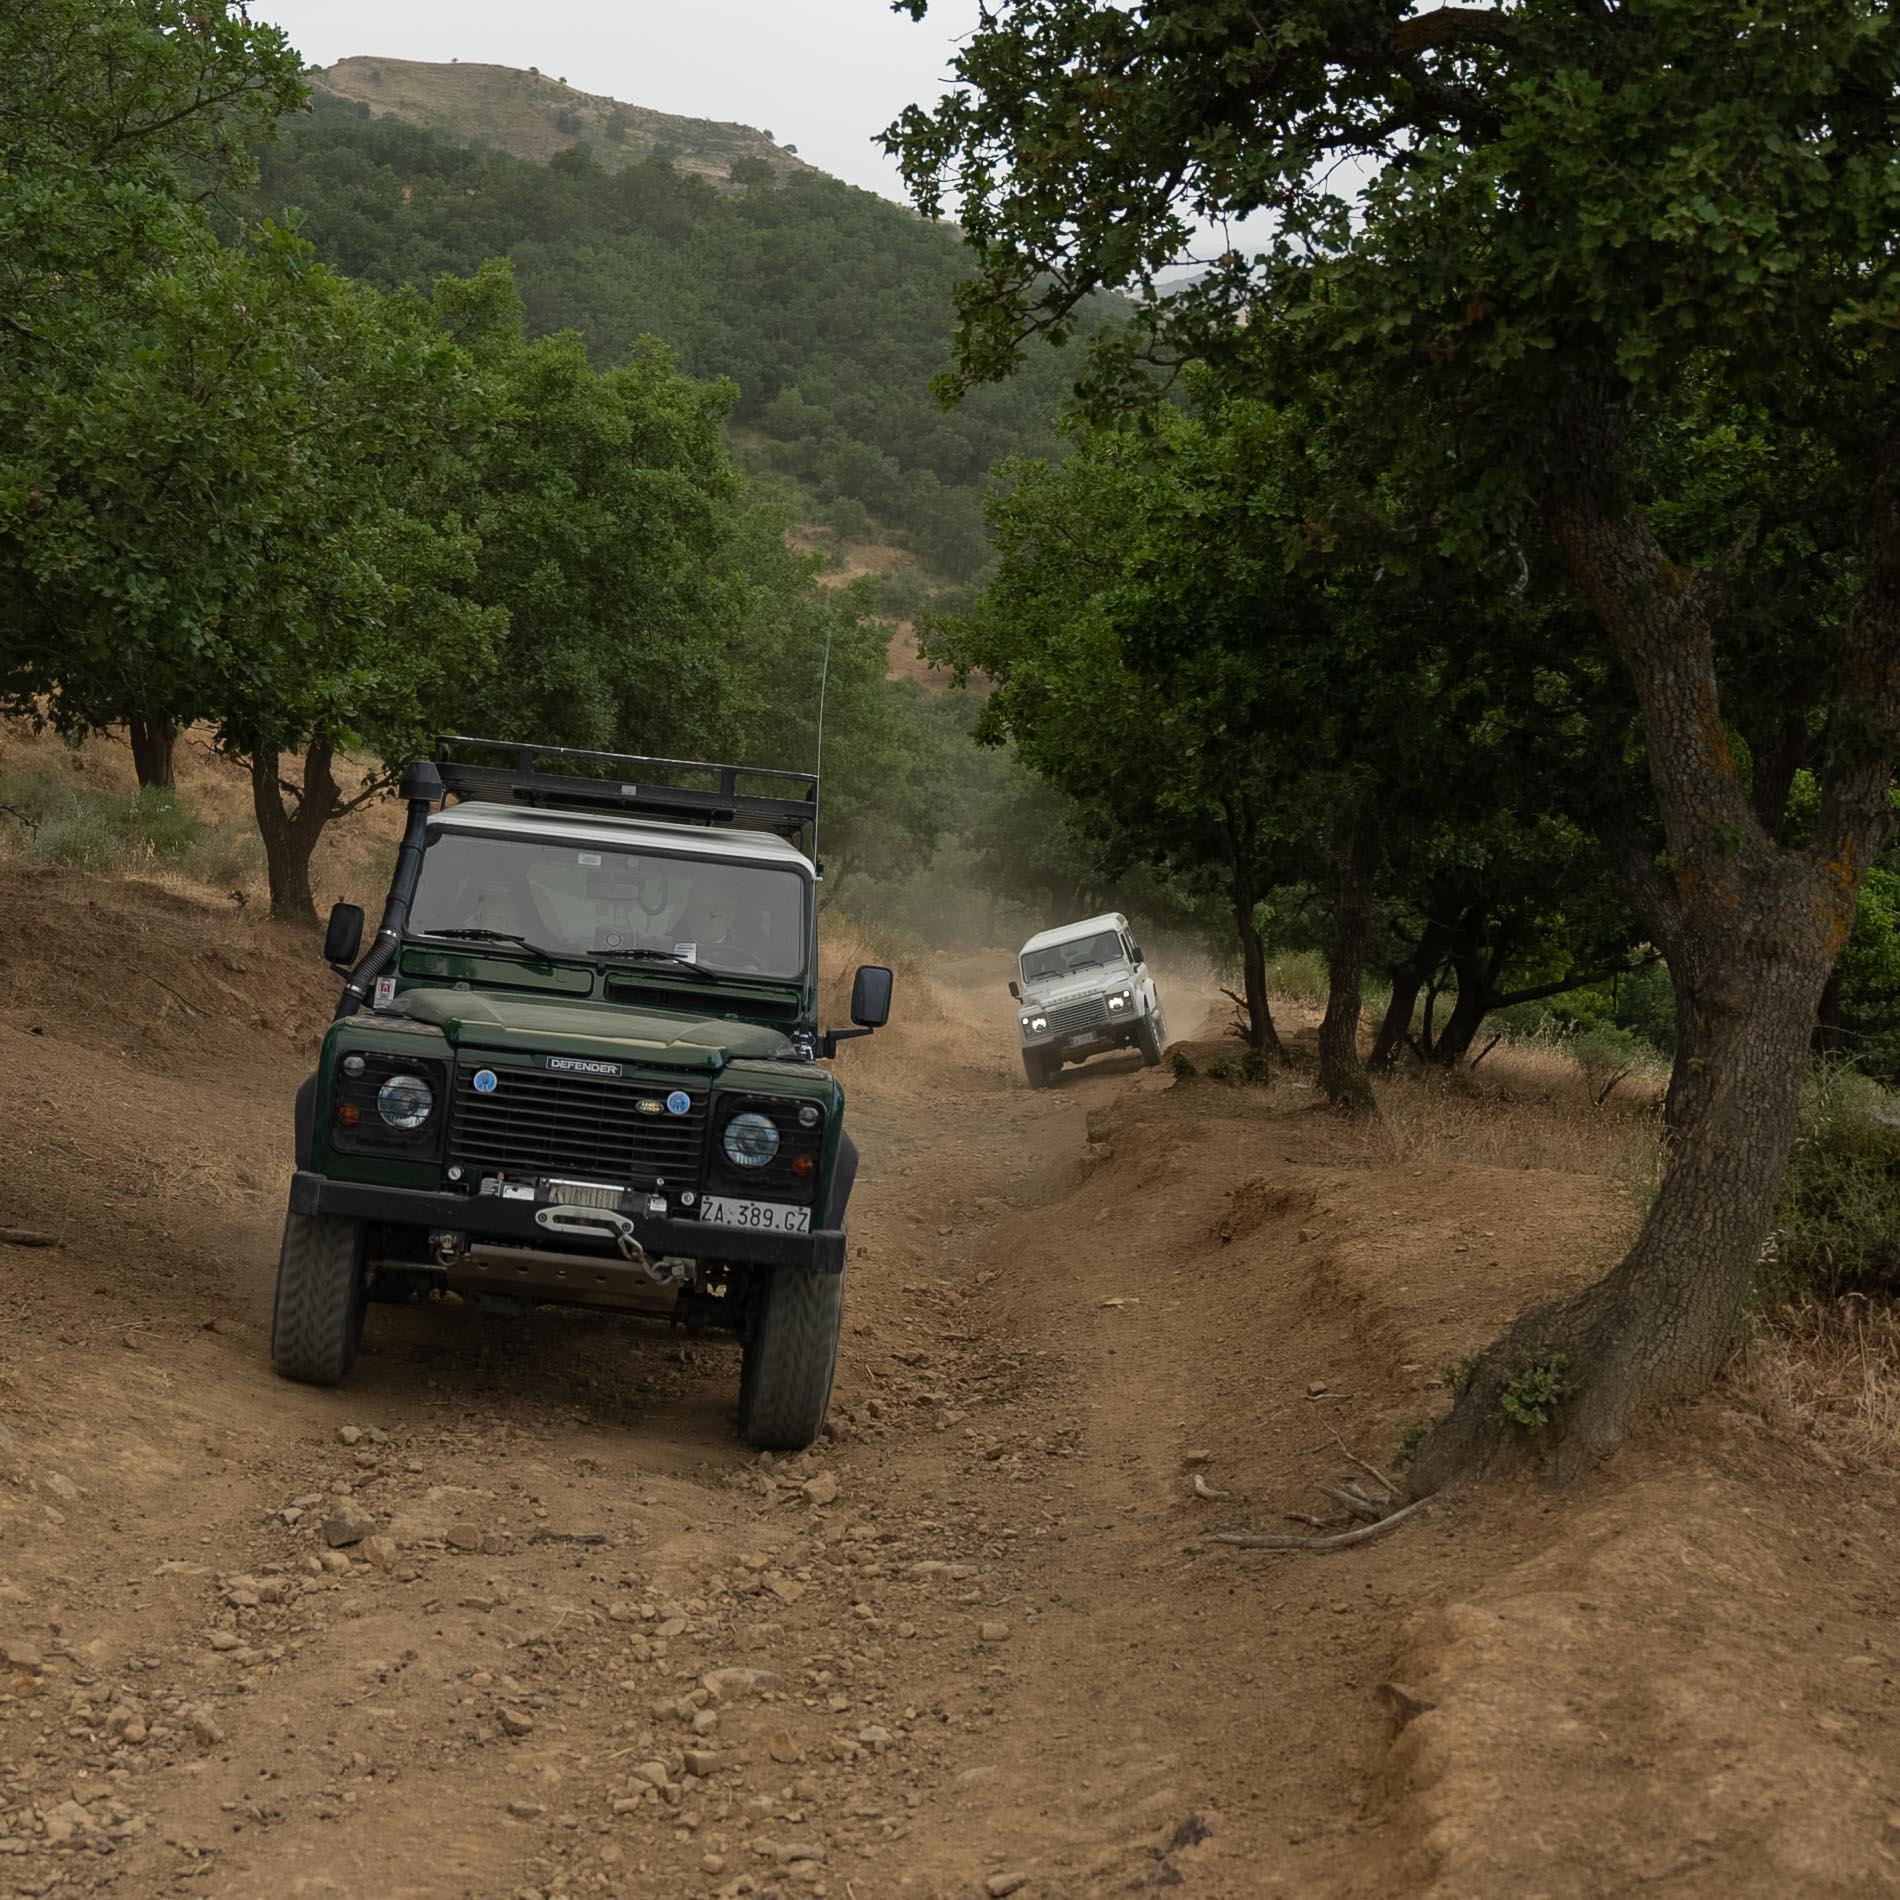 Land_Rover_Tour_Sicilia_2021_Land_Rover_Experience_Italia_-44